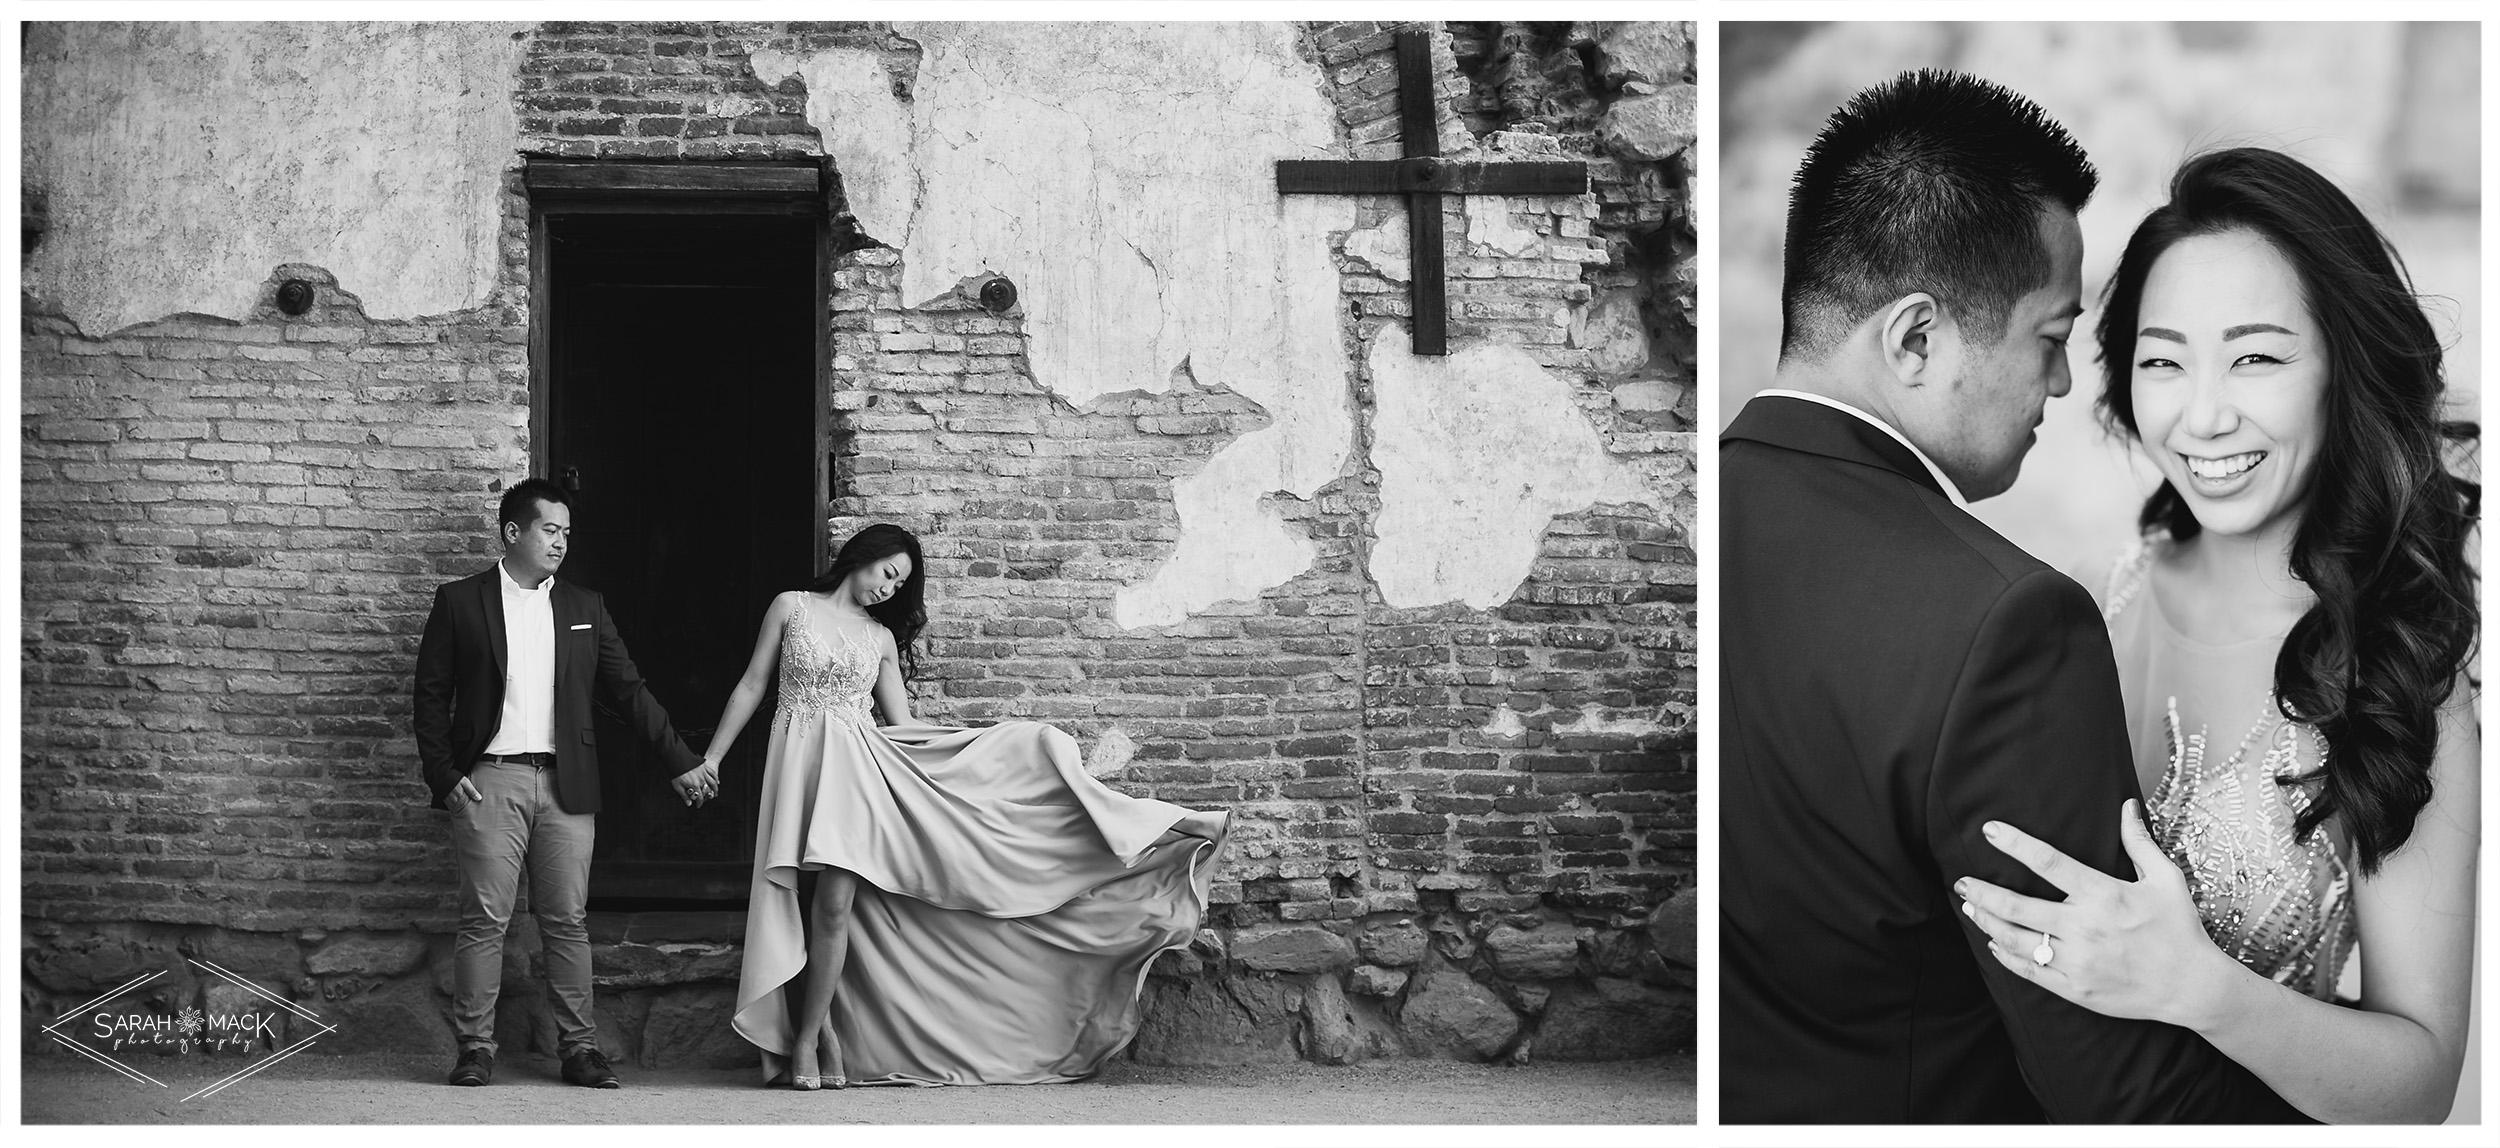 CJ-Mission-San-Juan-Capistrano-Engagement-Photography-4.jpg